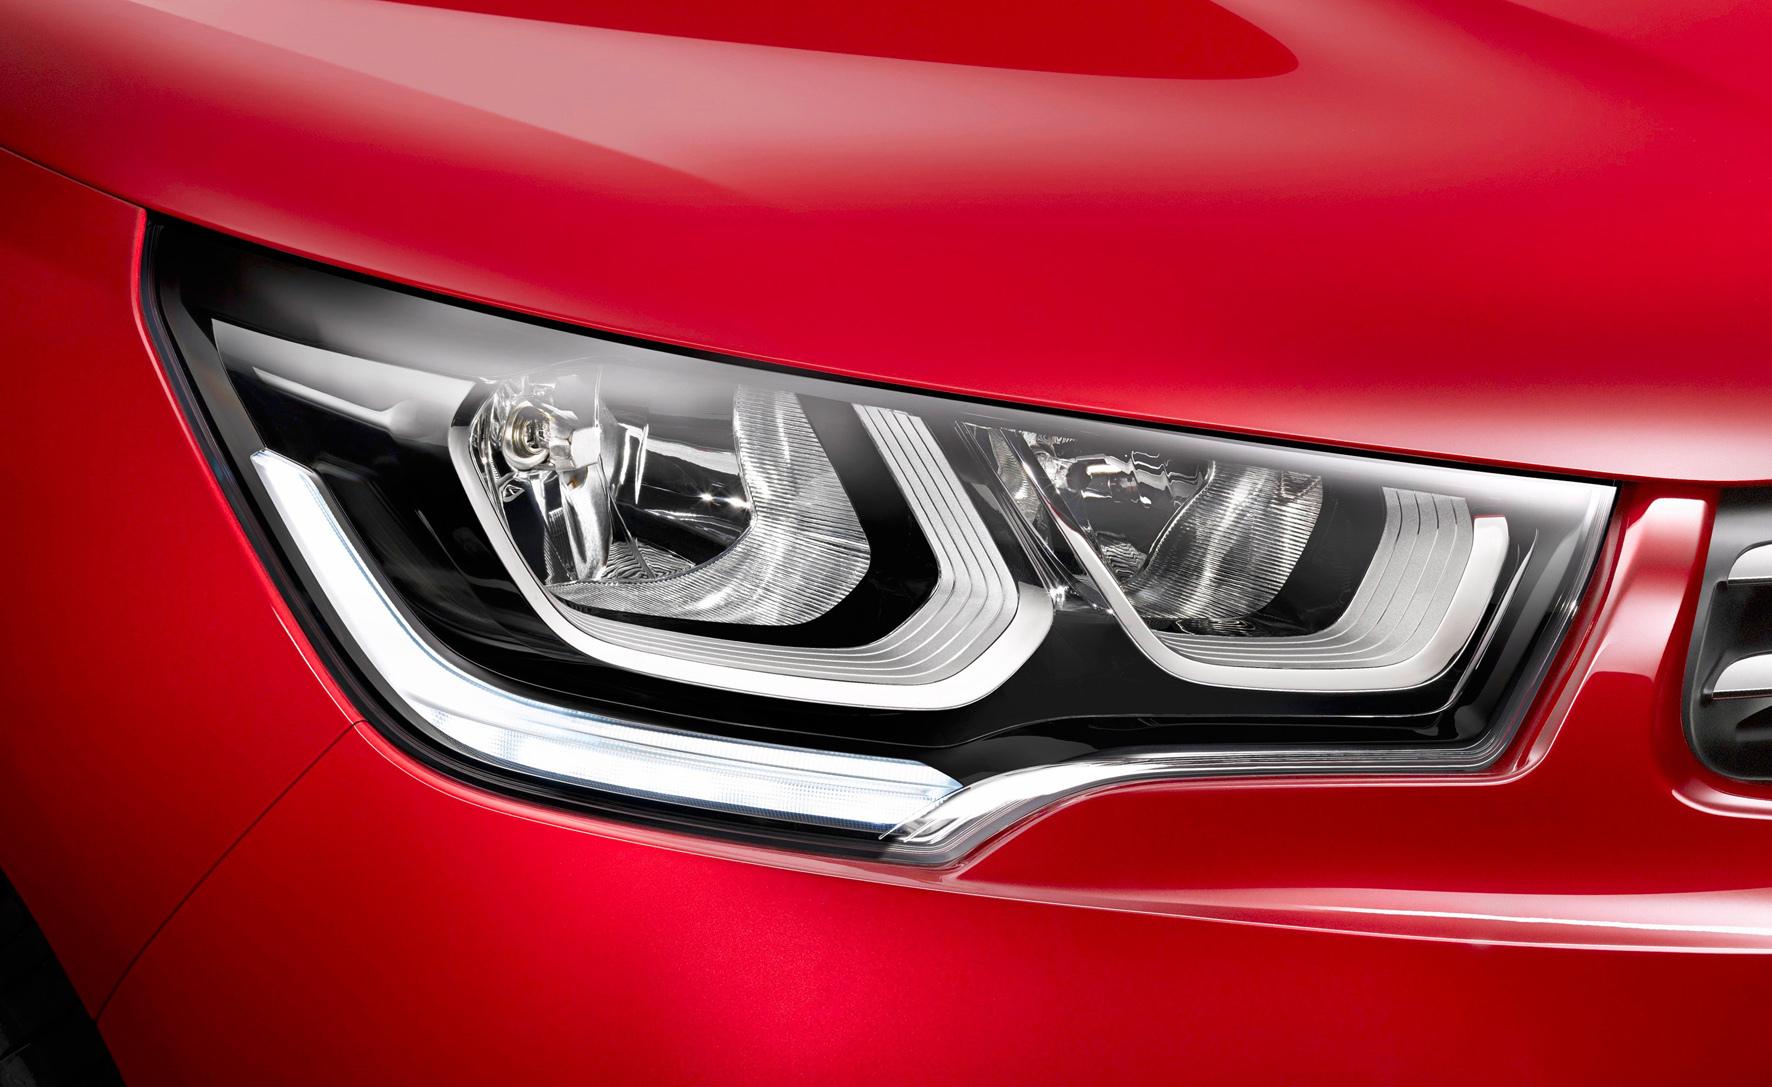 2015 Citroen C4 headlight